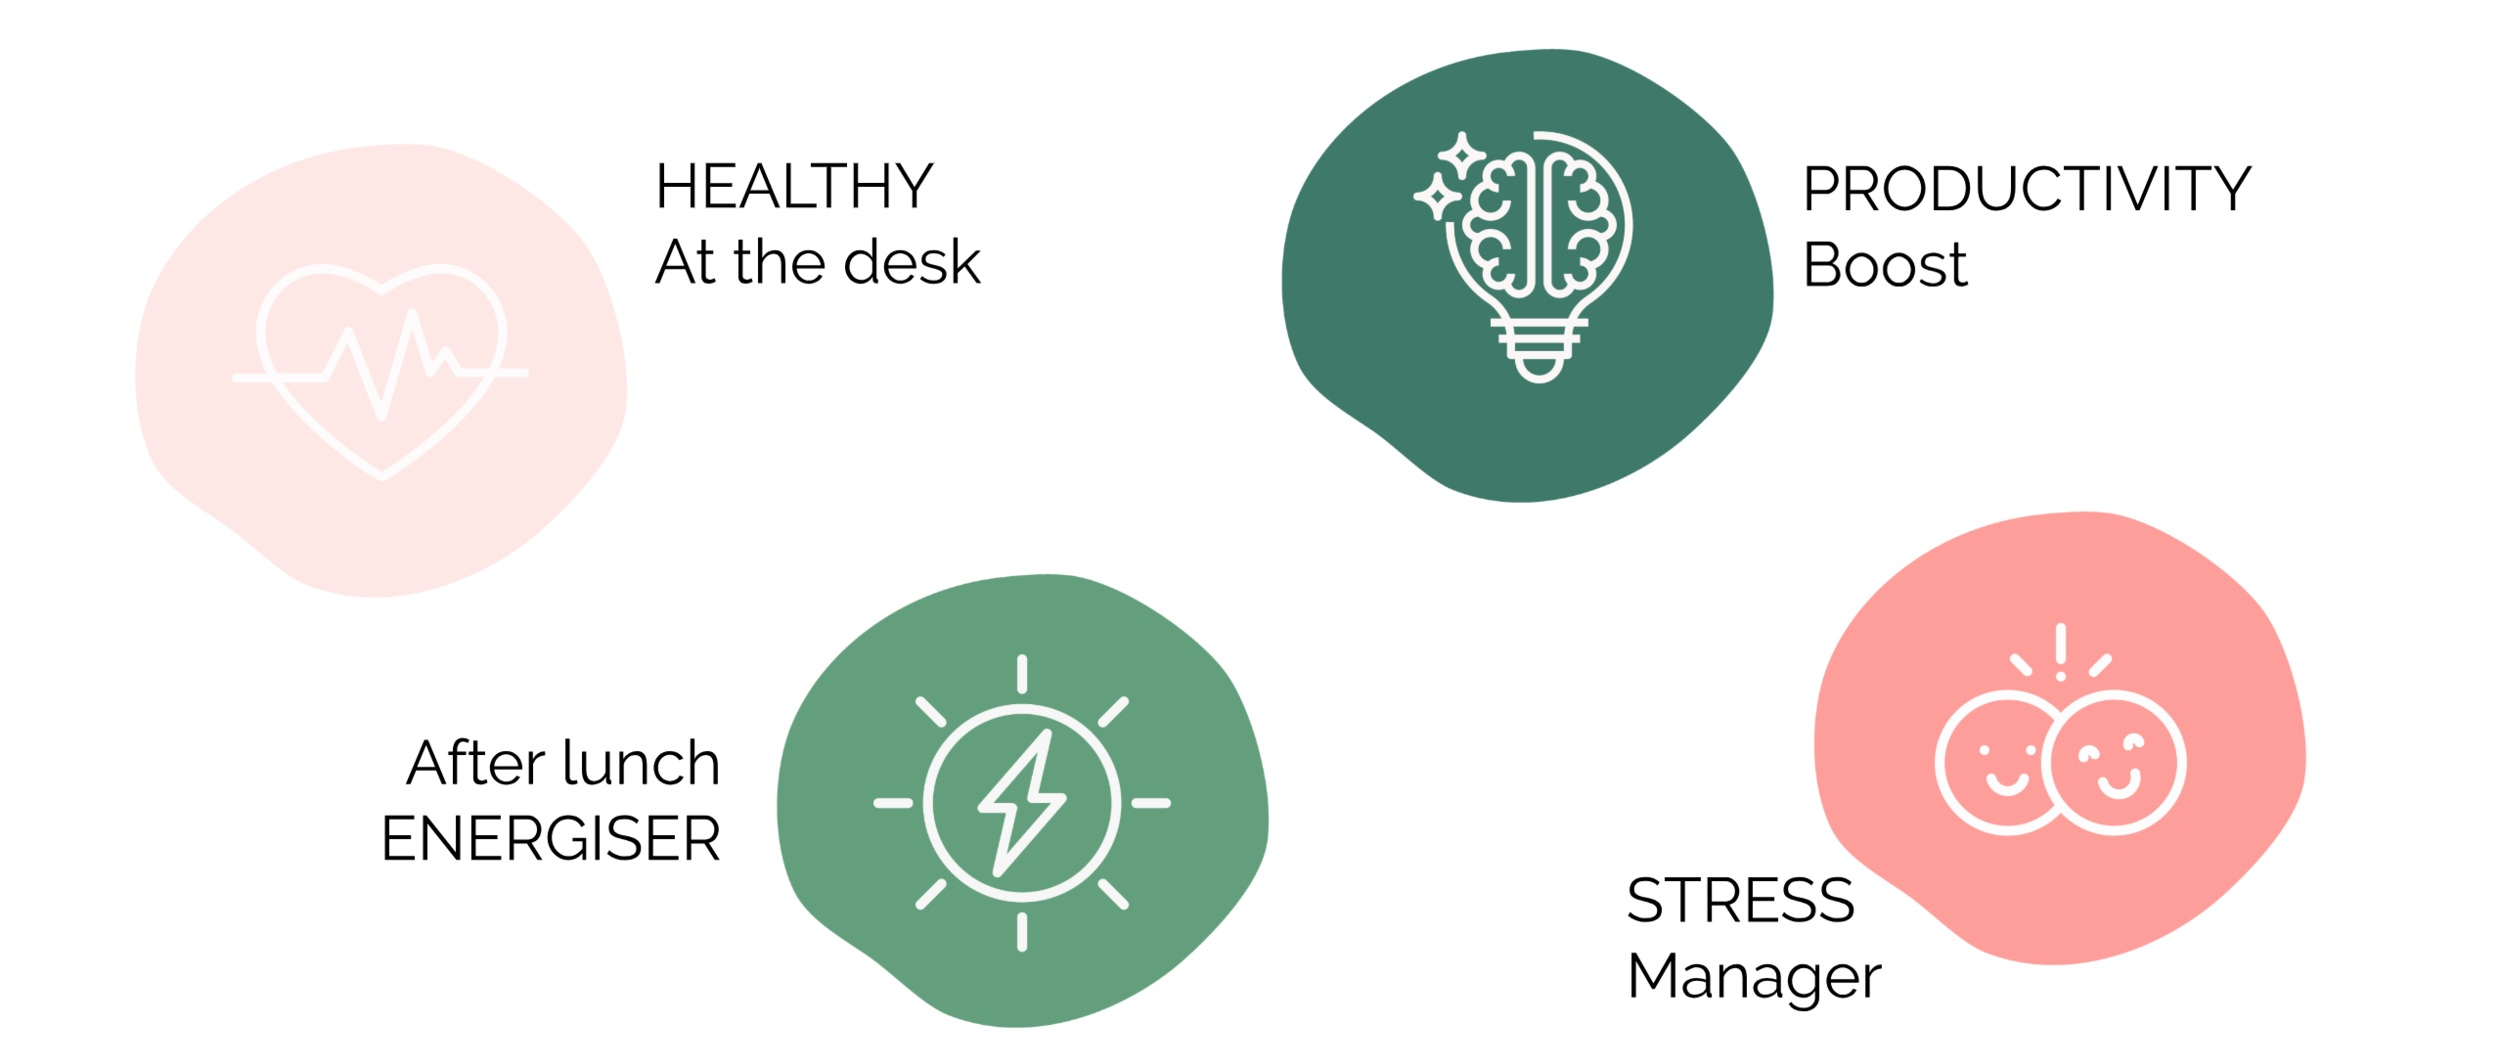 real-life-yoga-methods-technique-reduce-stress-management-.jpg